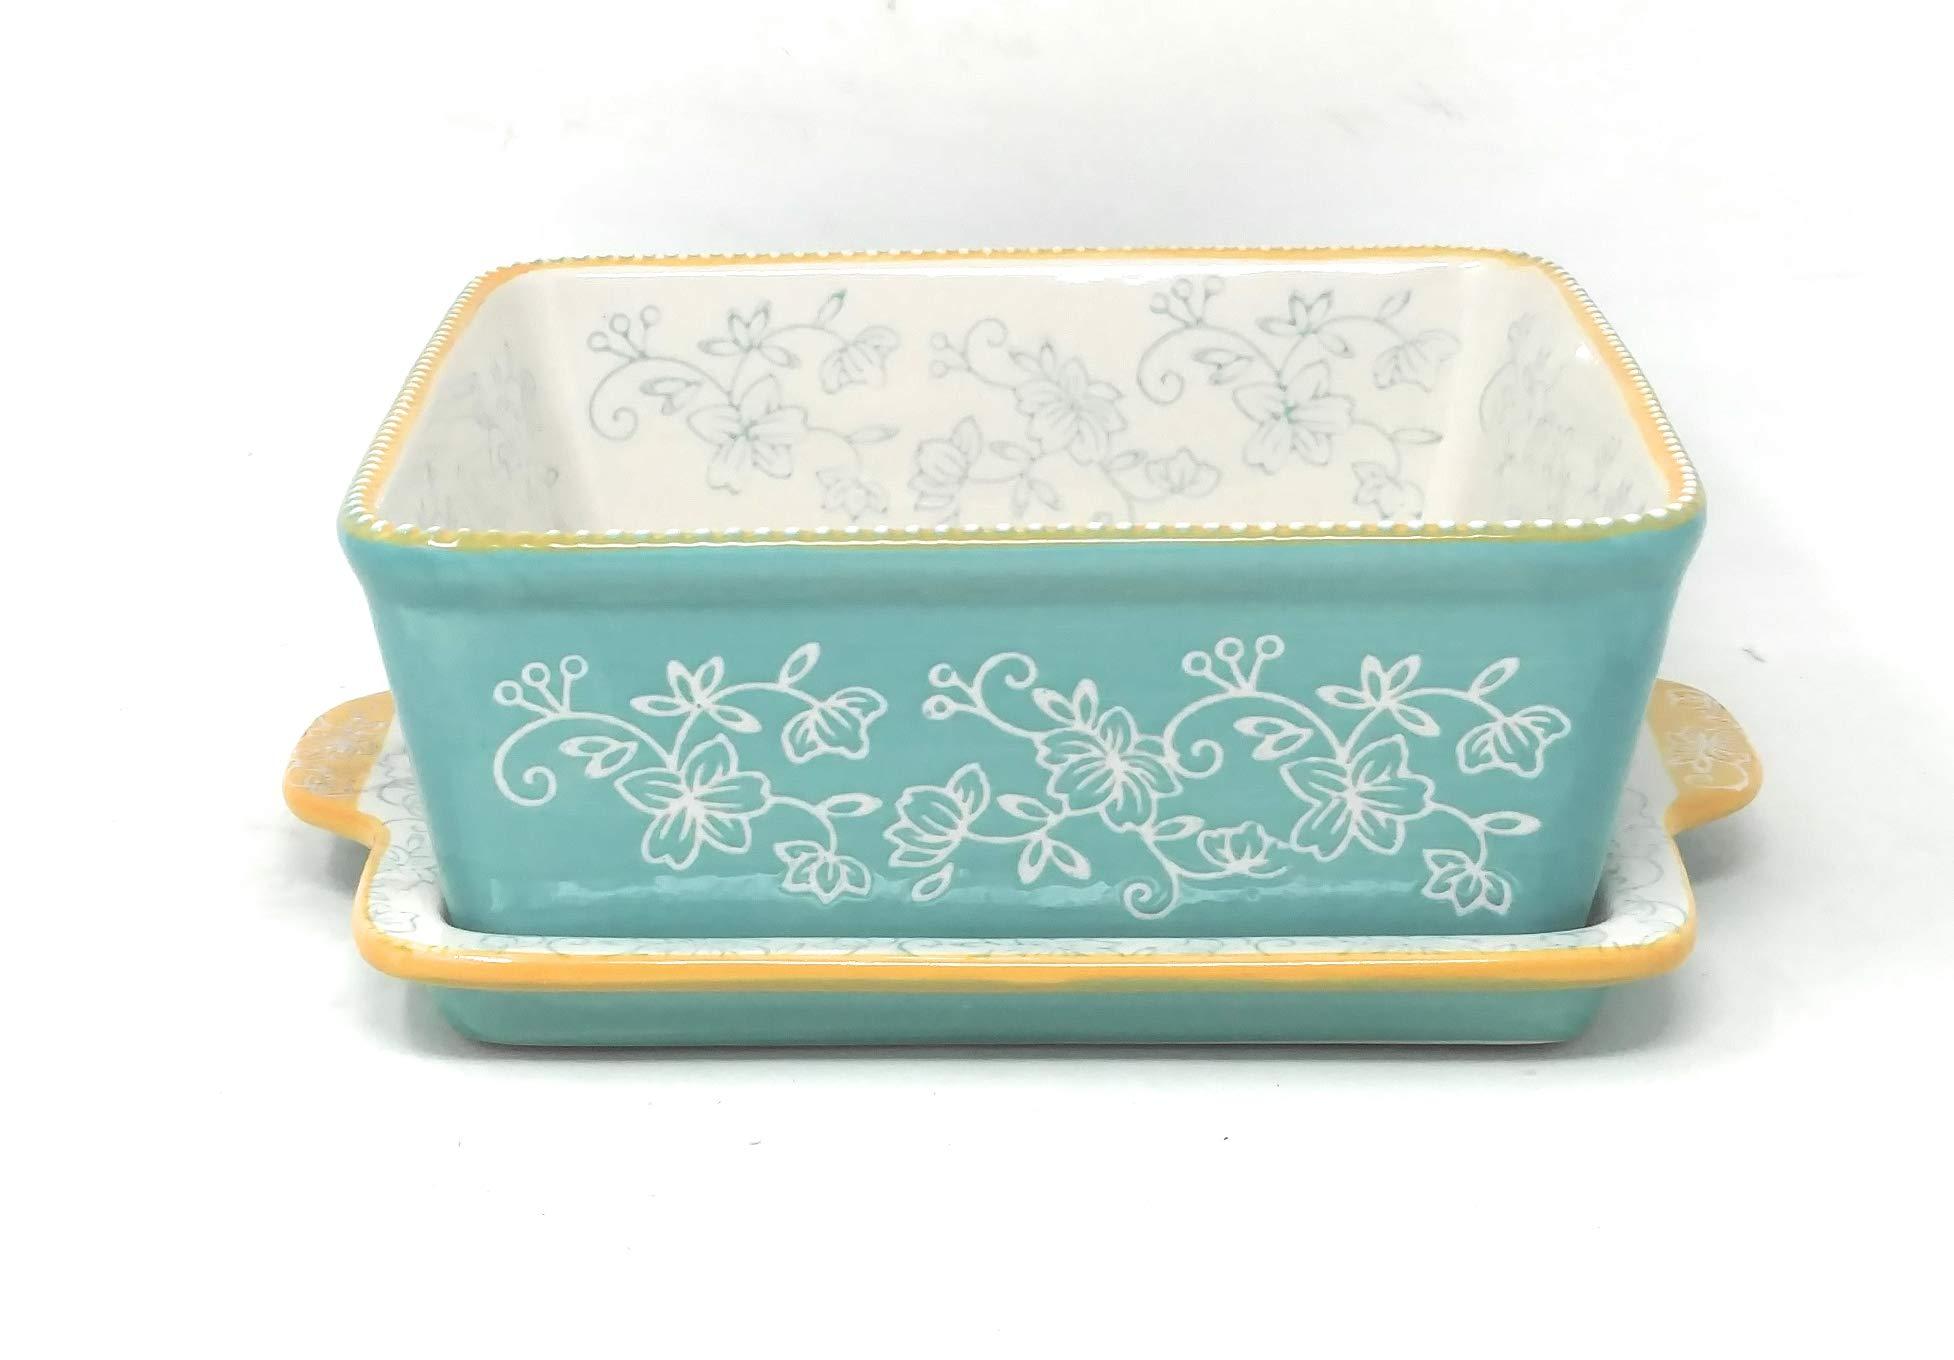 Temp-tations 8x8 Brownie Baker w/Lid-It (Tray) 1.5 Qt Square Casserole Dish (Floral Lace Teal)